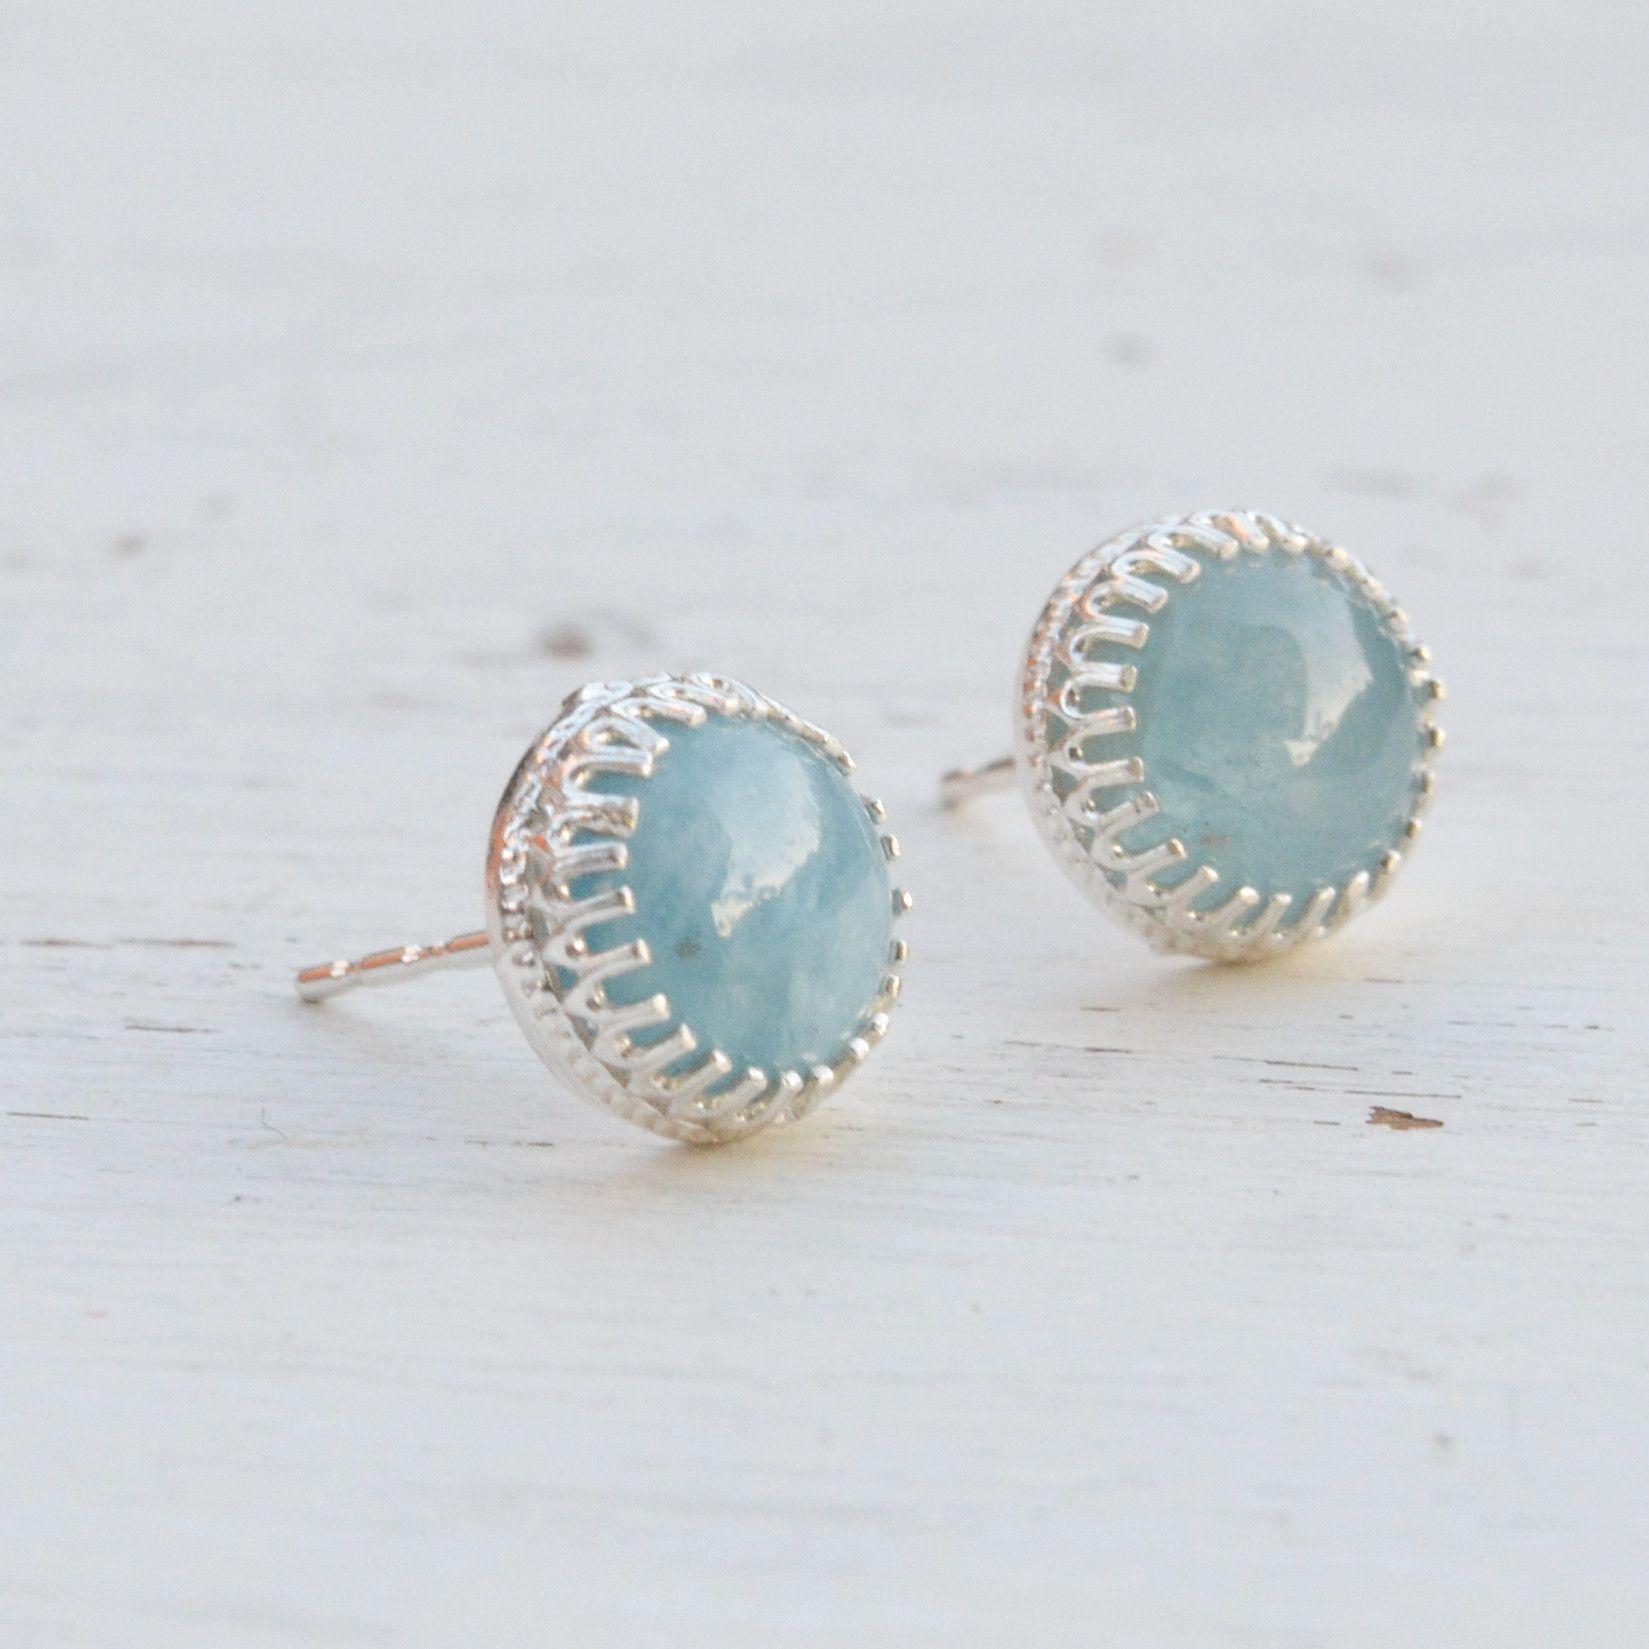 Aquamarine Earrings Sterling Silver Studs